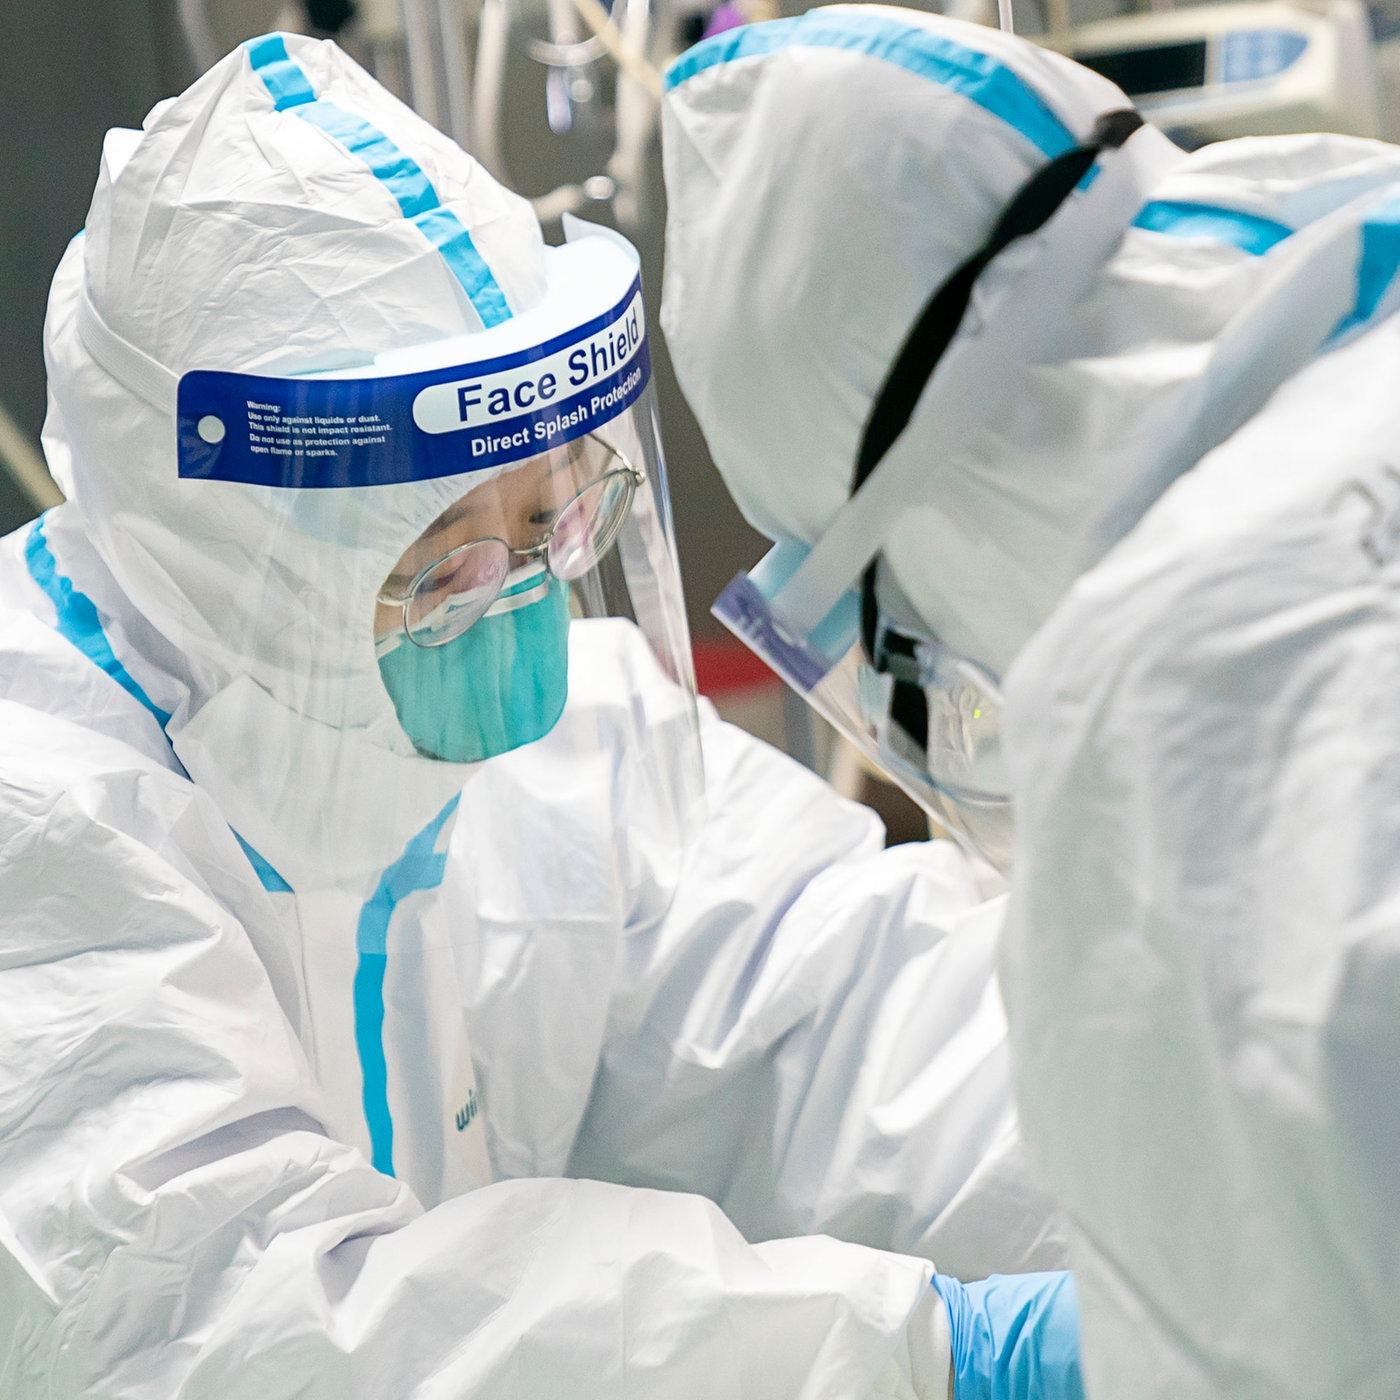 Coronavirus Ubertriebener Hype Monitor Vom 30 01 2020 Sendungen Monitor Das Erste